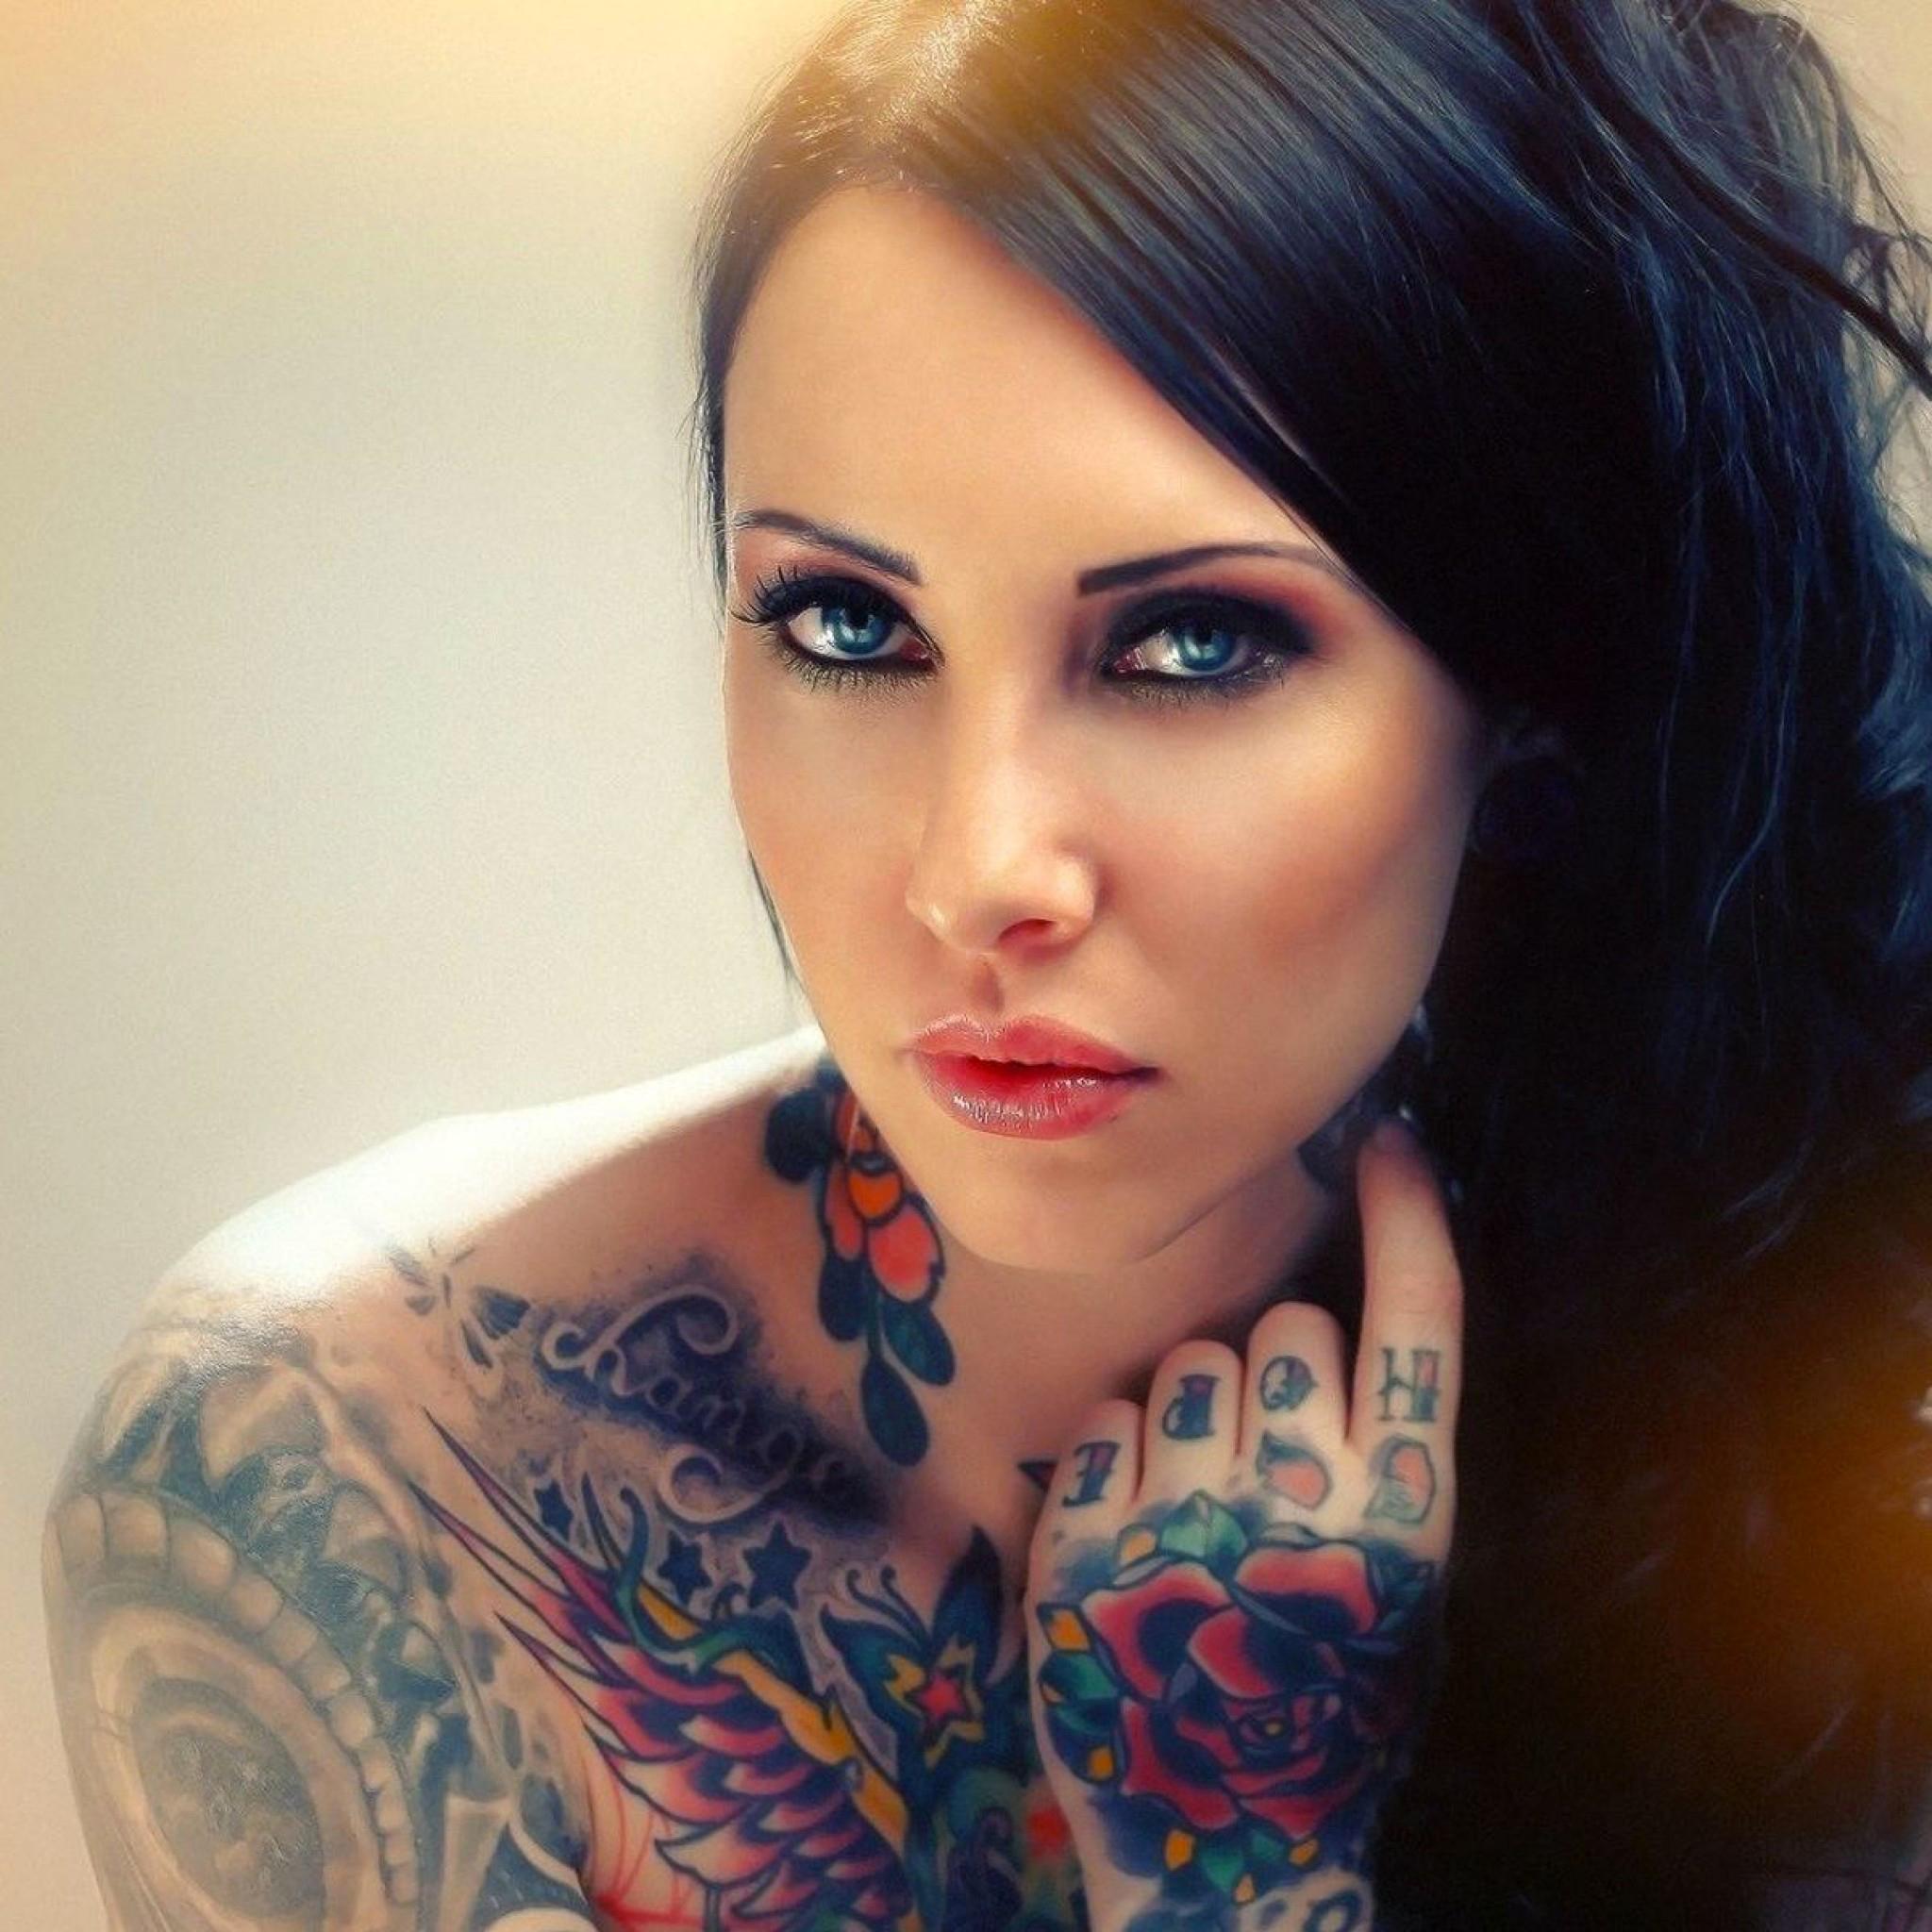 Tattoos Girl 3Wallpapers iPad Tattoos Girl   iPad